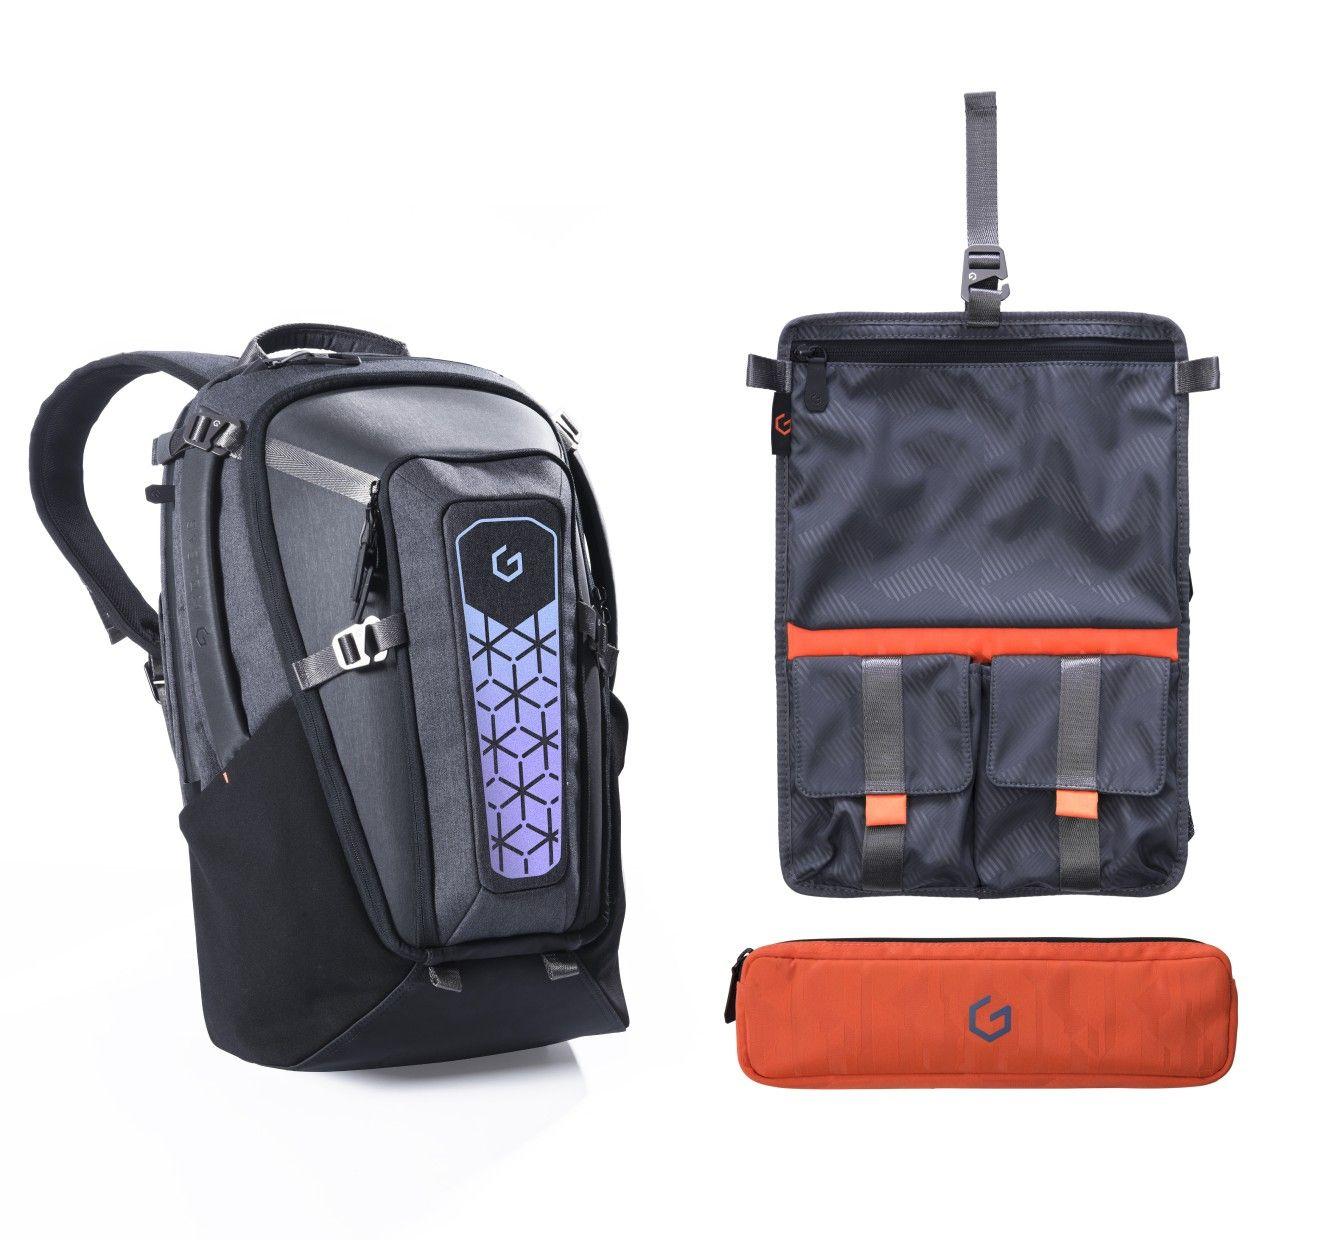 b9784d28b2fb Waterproof Travel Backpack Kickstarter | Building Materials Bargain ...